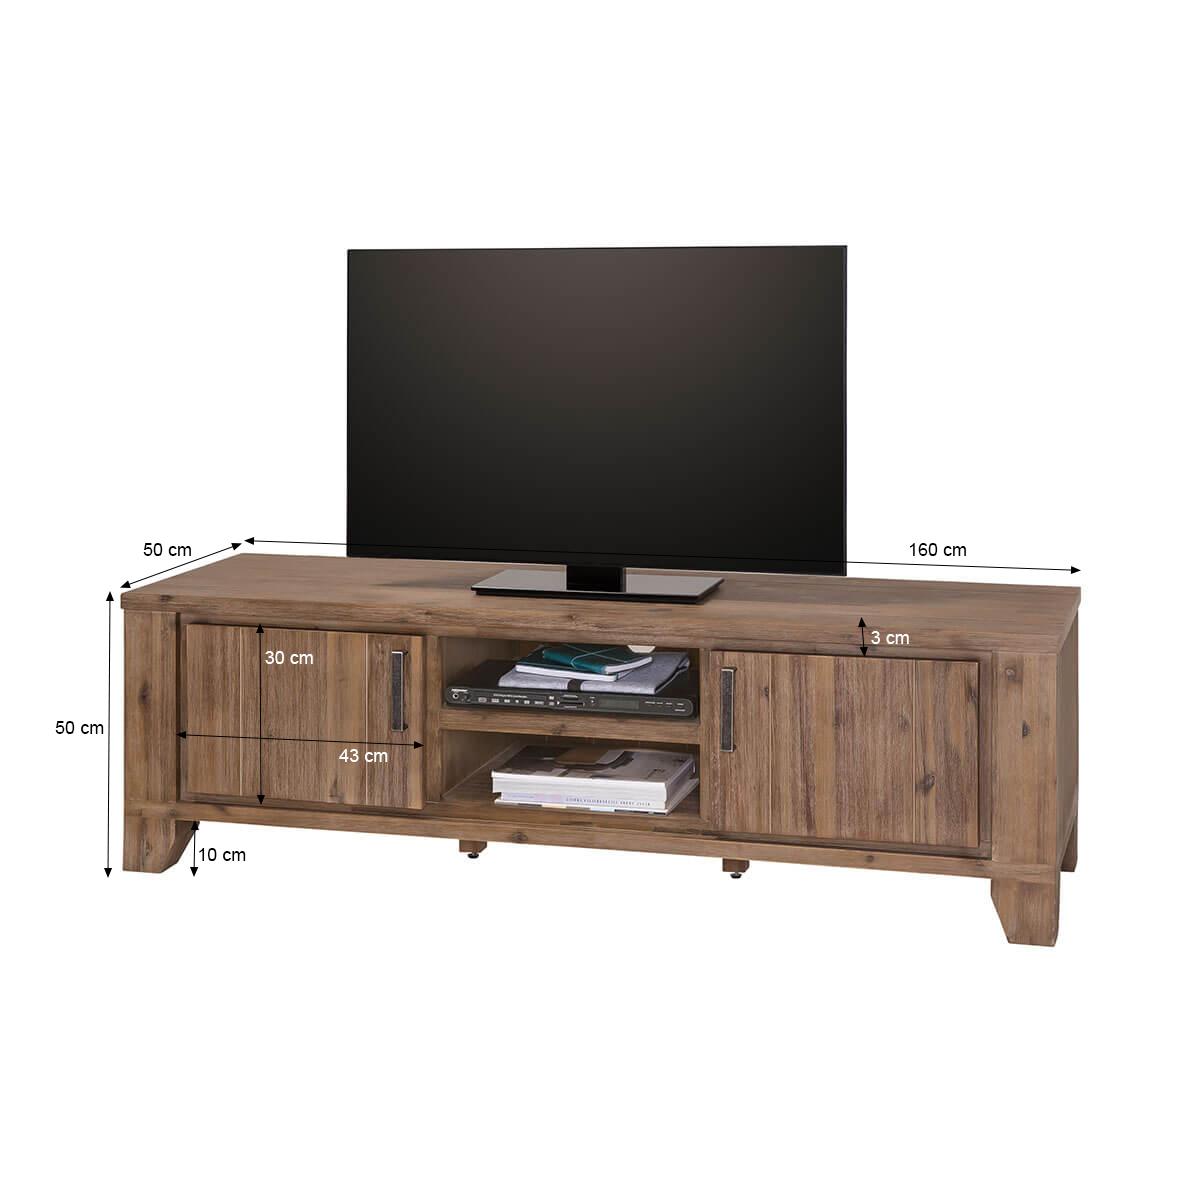 tv lowboard avora 160 cm breit in braun akazie massiv. Black Bedroom Furniture Sets. Home Design Ideas